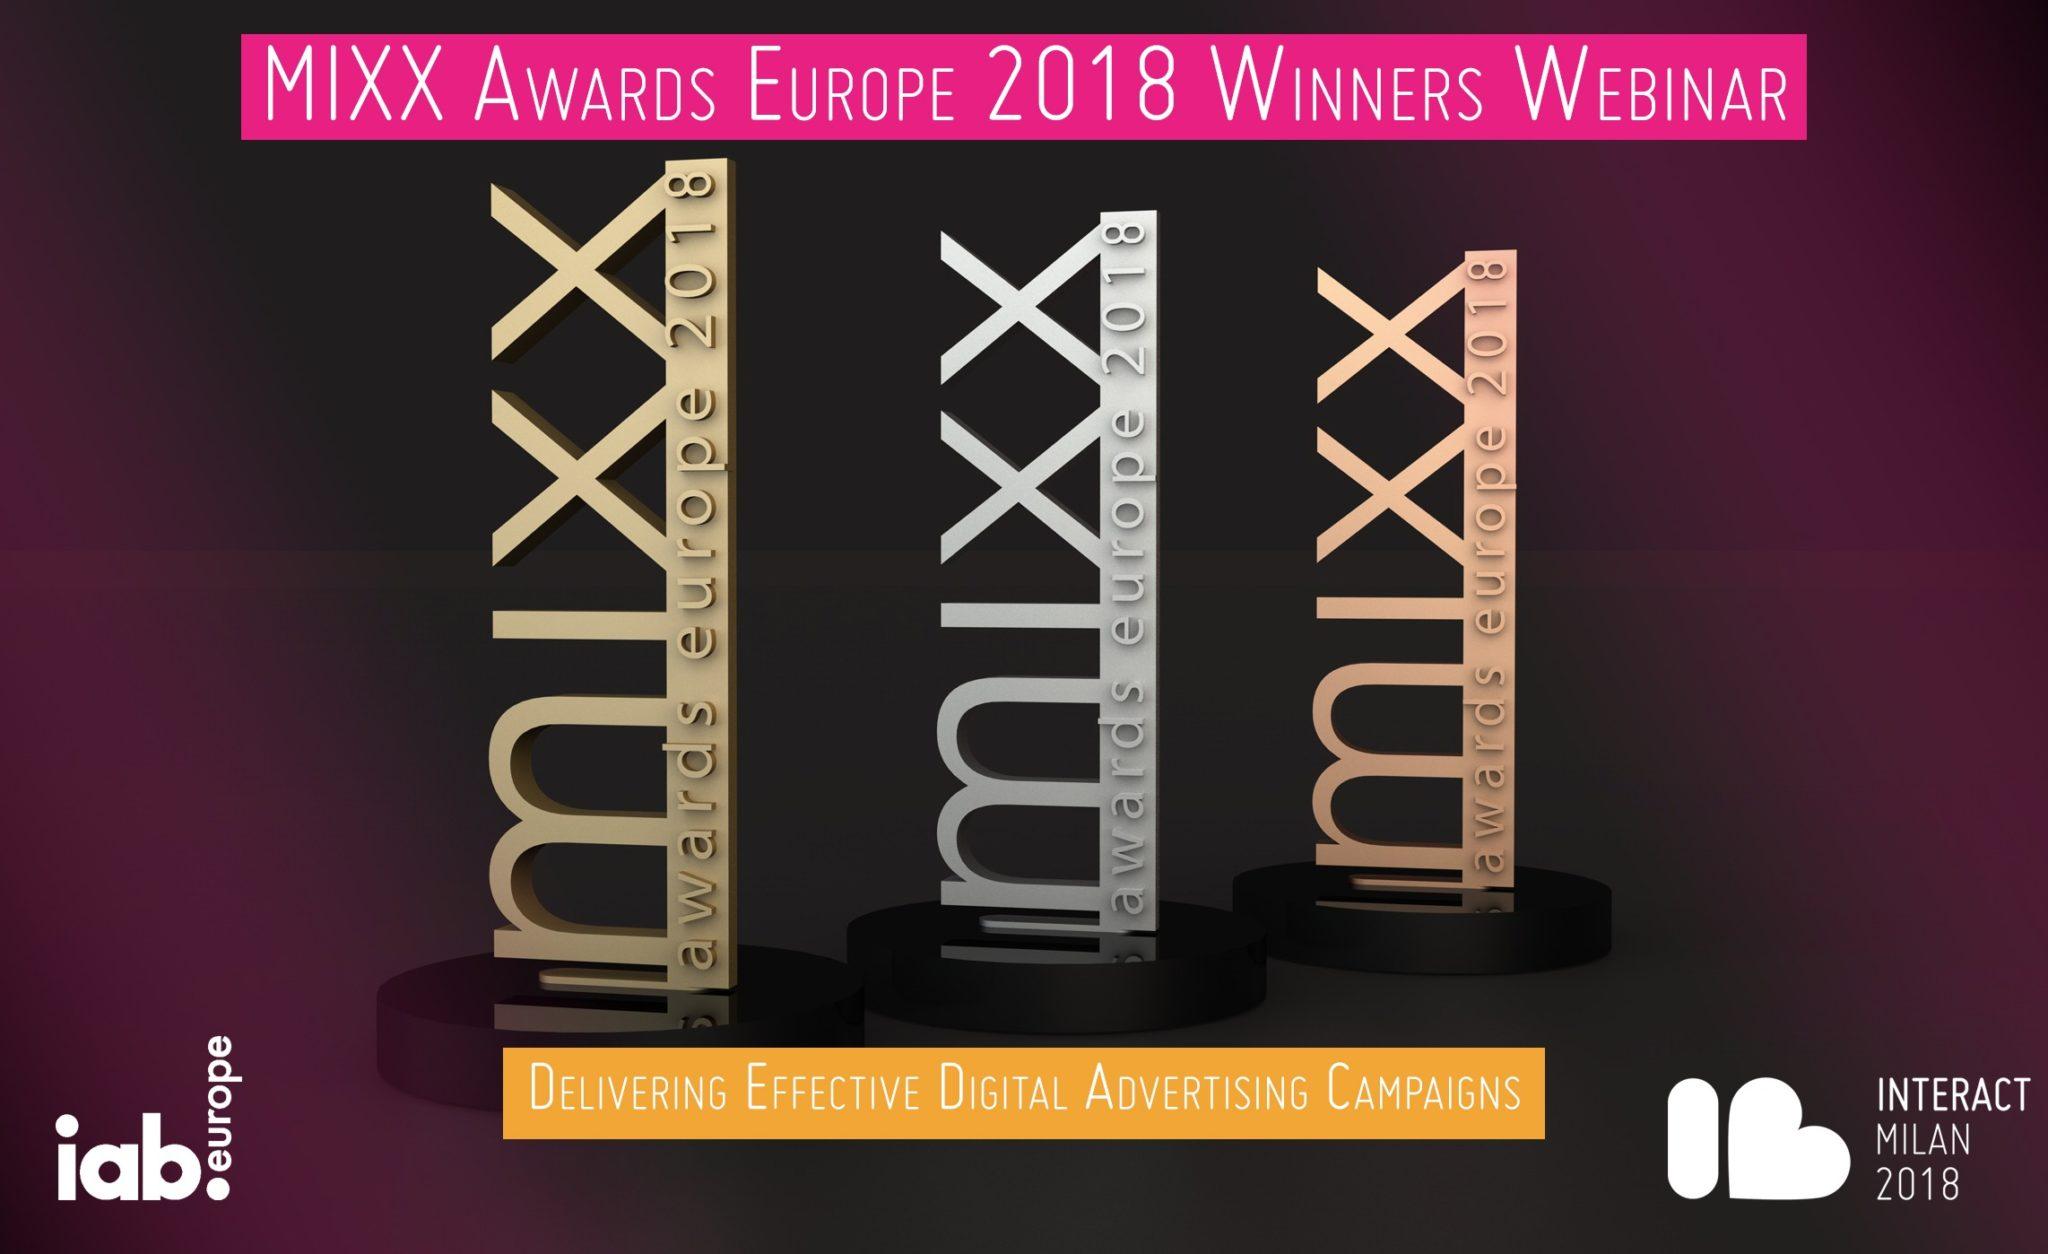 MIXX WINNERS webinar 1 clean